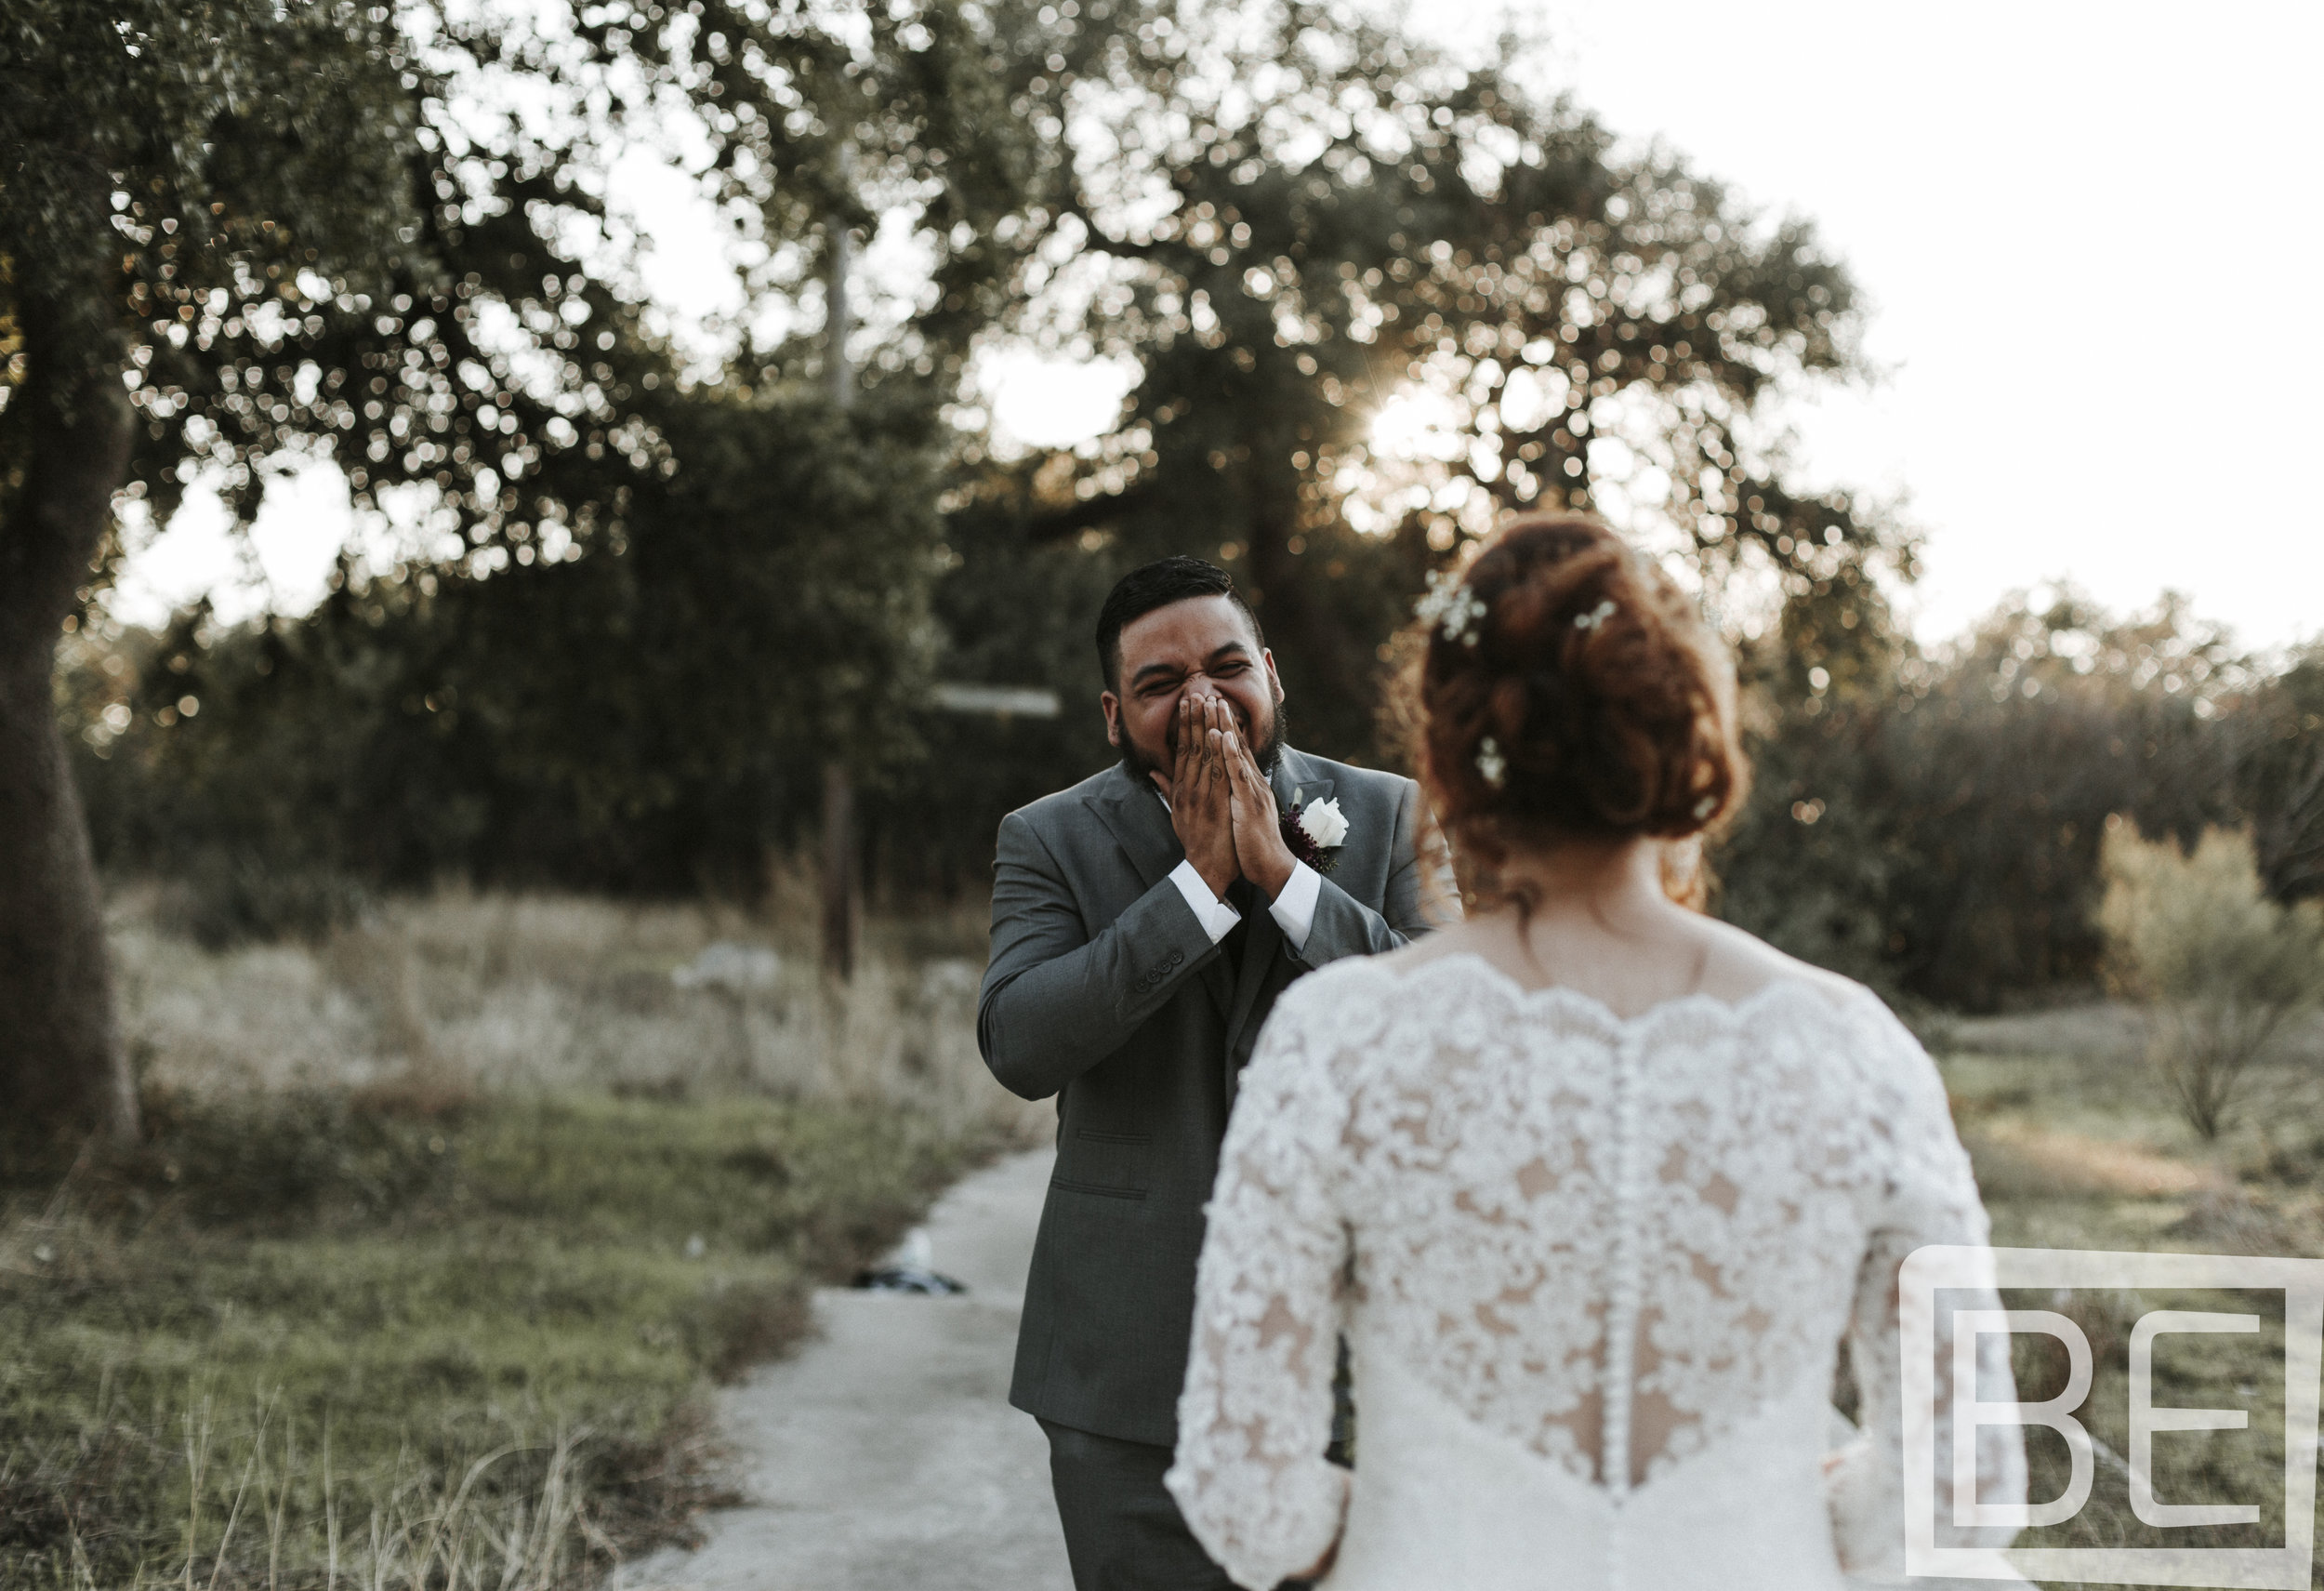 San Antonio Wedding - Soriano Wedding - Tanner Beason Photography-13.jpg